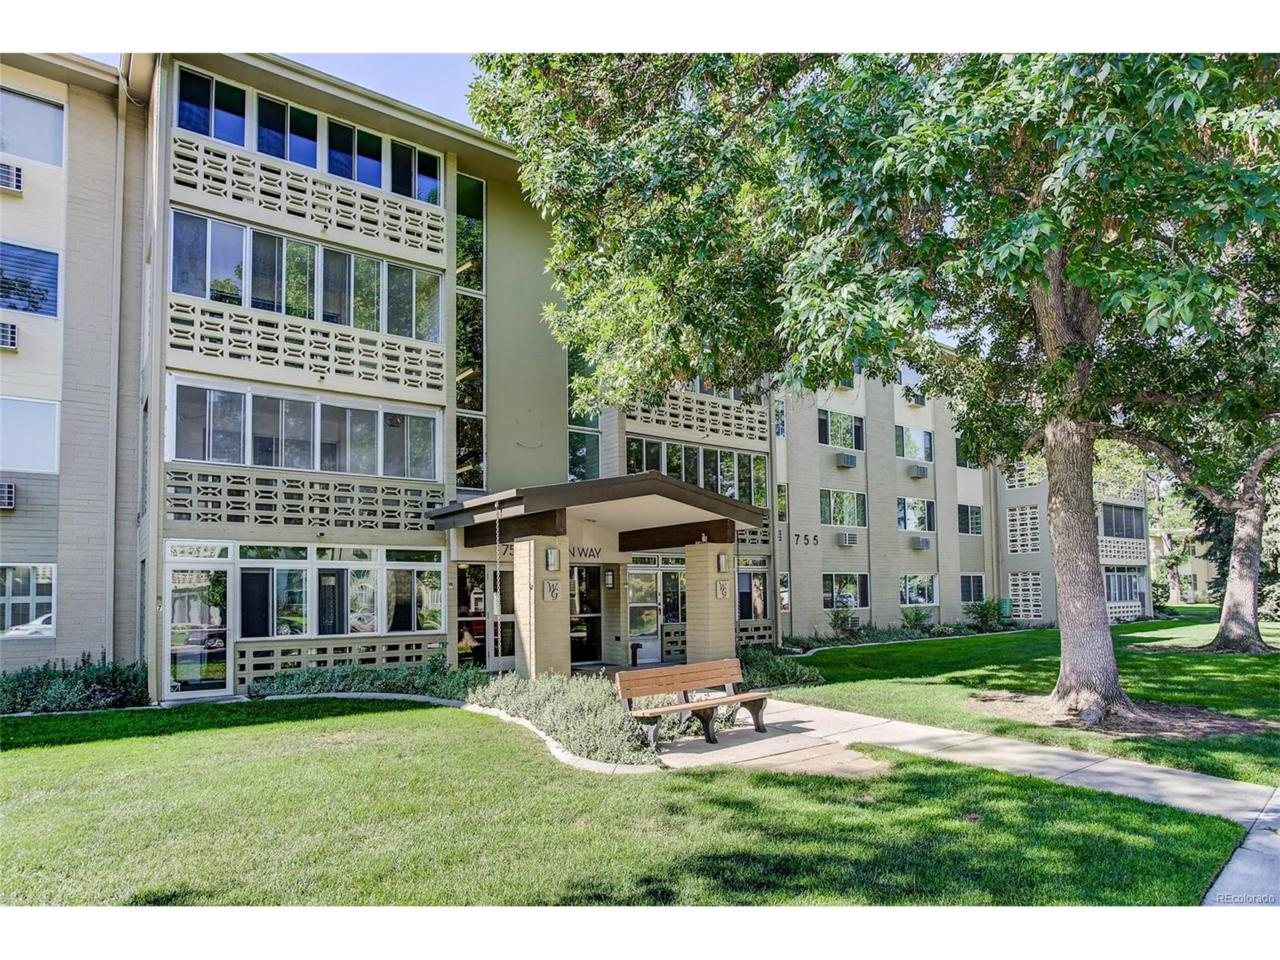 755 S Alton Way 12D, Denver, CO 80247 (MLS #5782118) :: 8z Real Estate